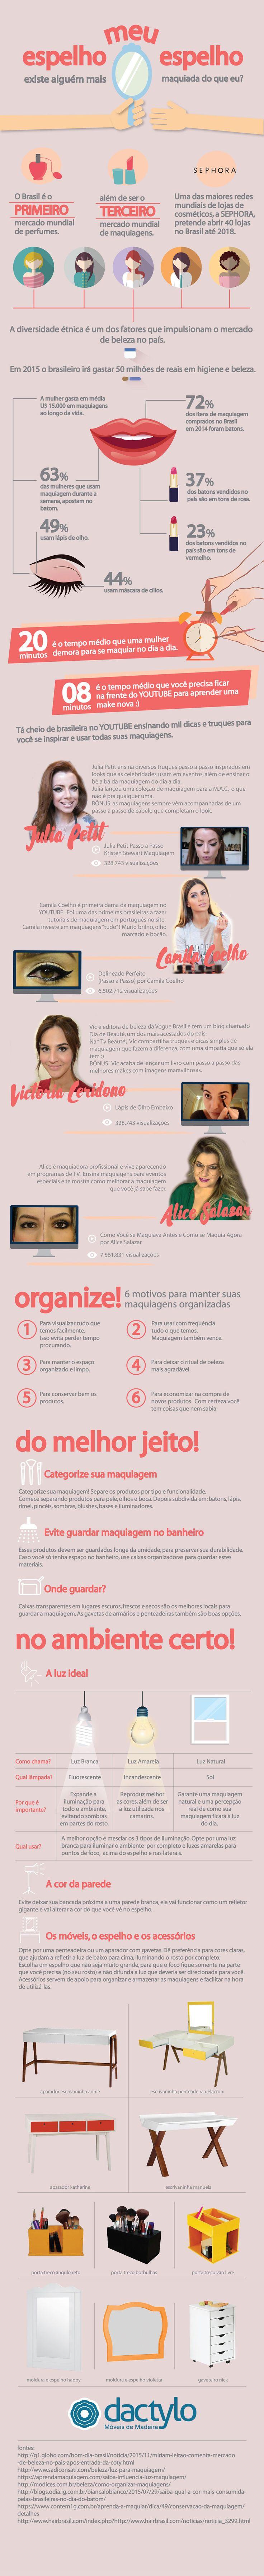 infografico-beleza-01-maquiagem-blog-dactylo